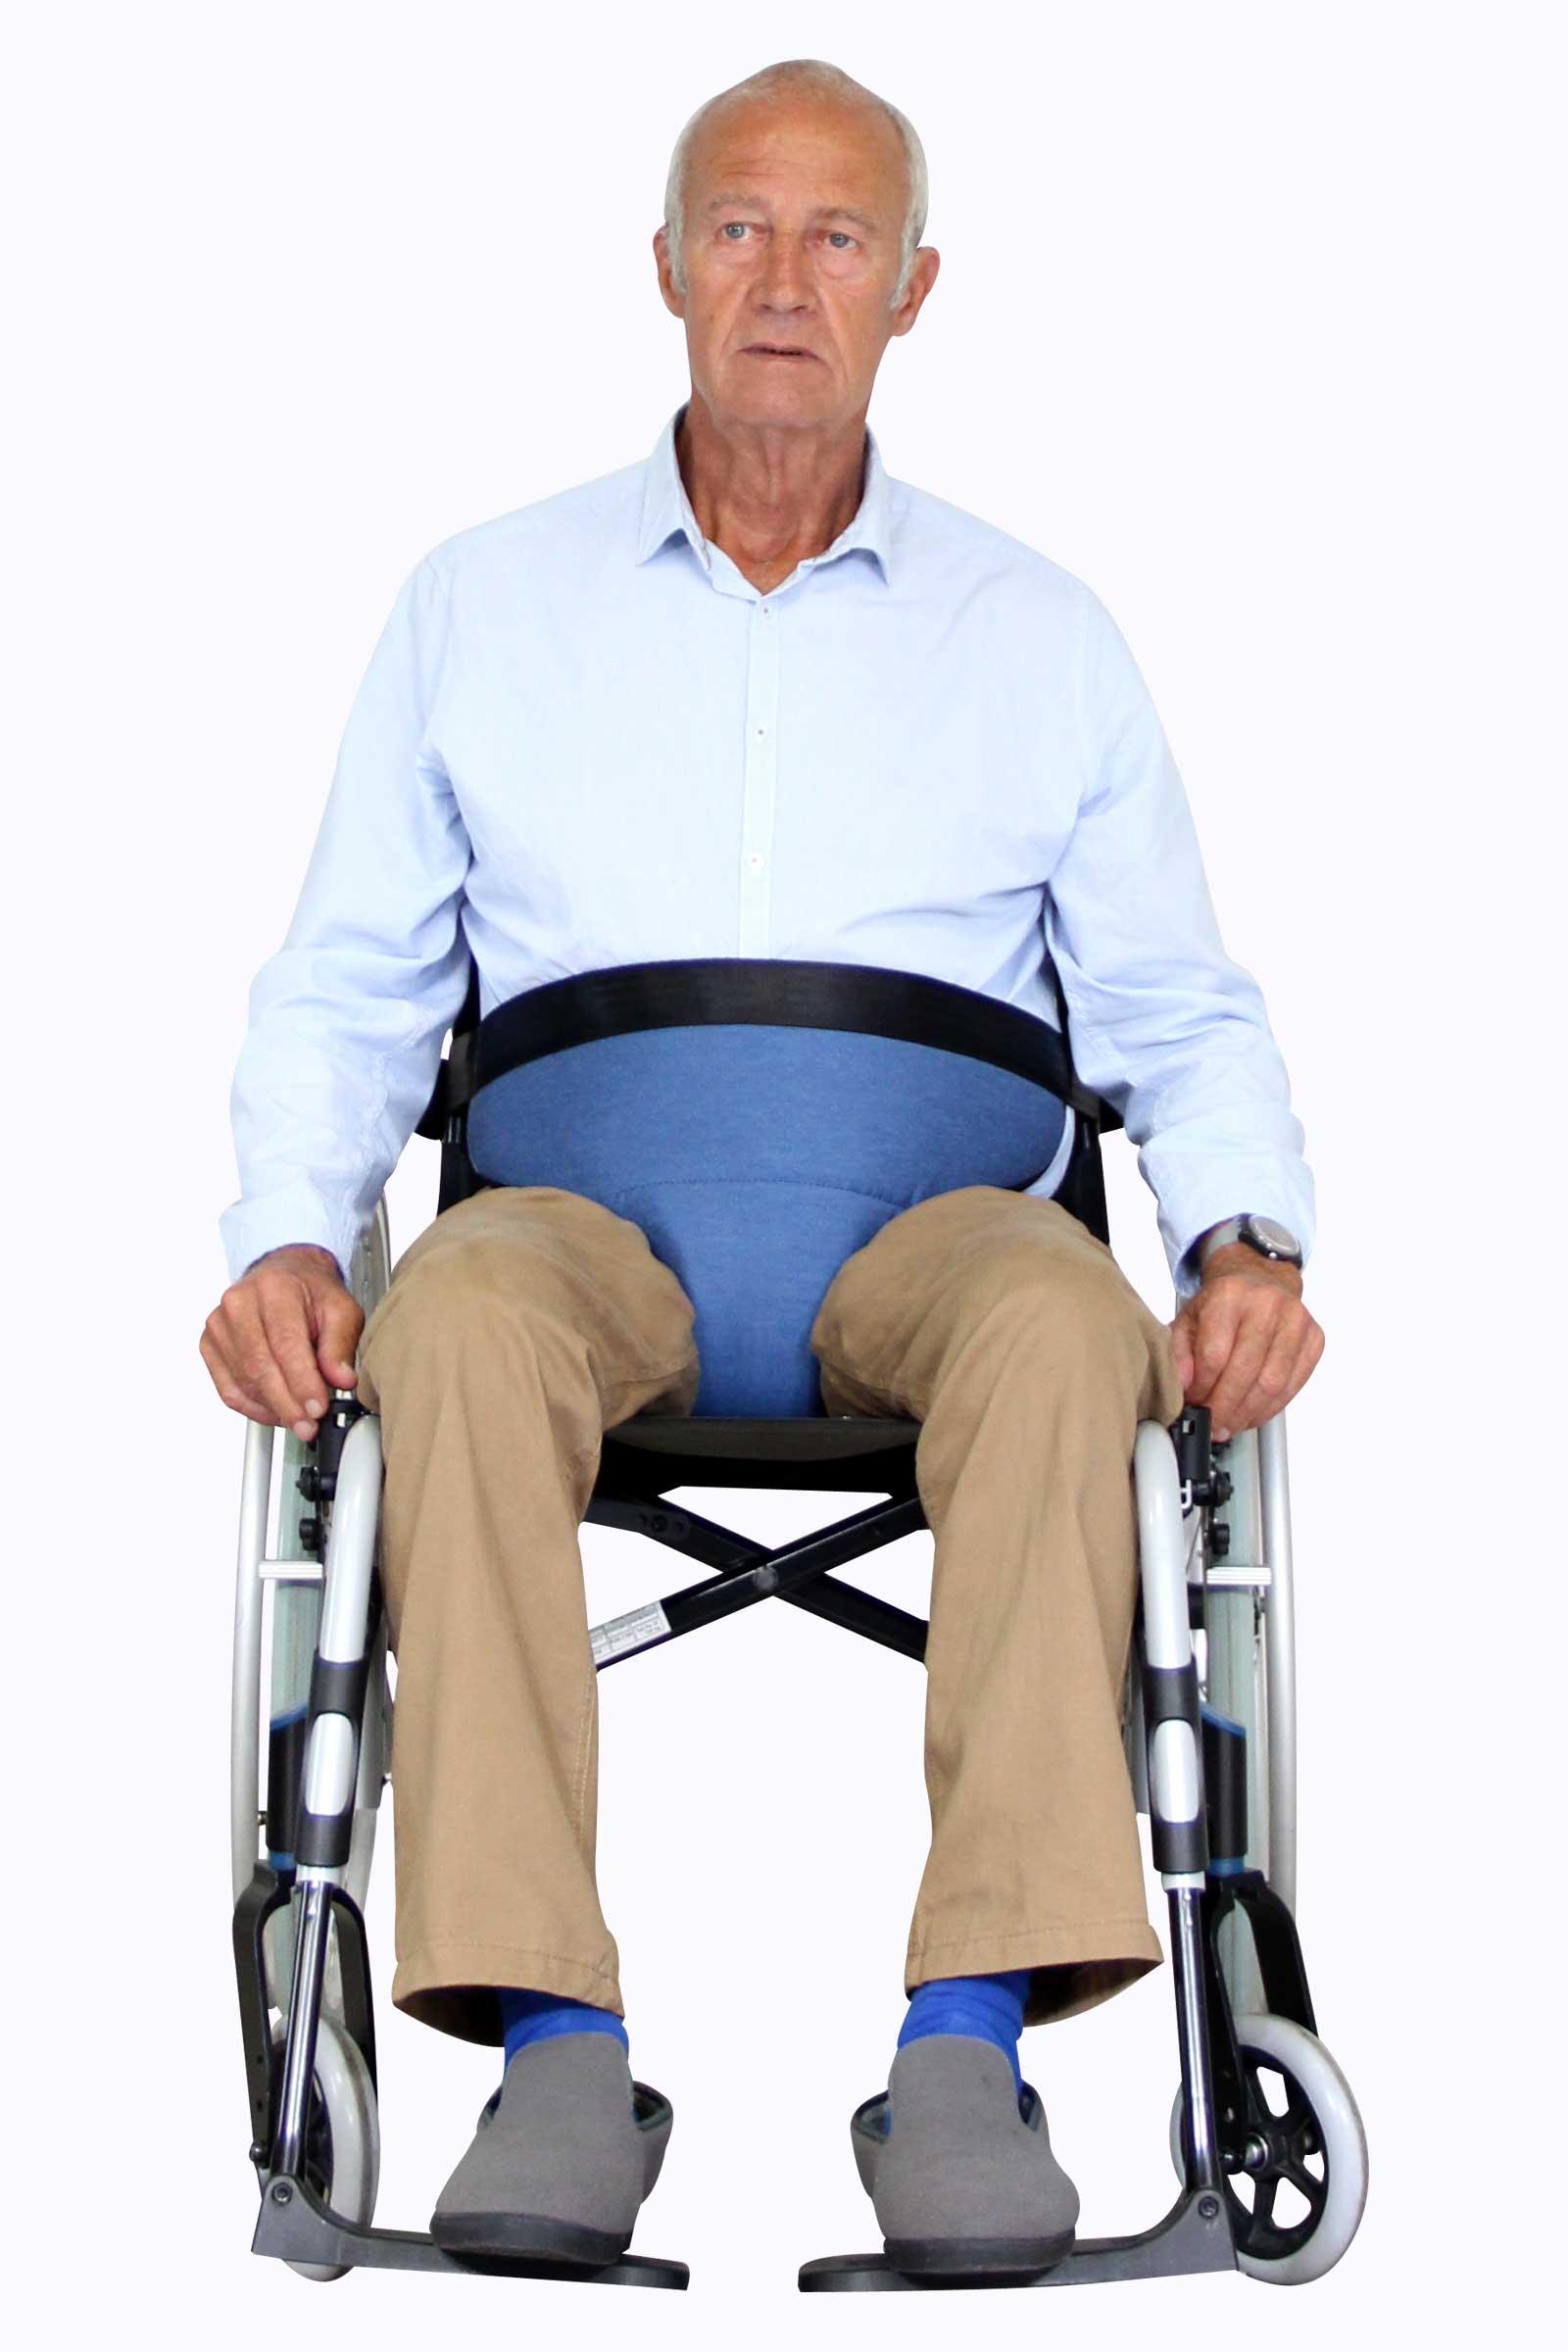 NAUSICAA Medical - Patient Positioning - Pelvic Comfort Belt